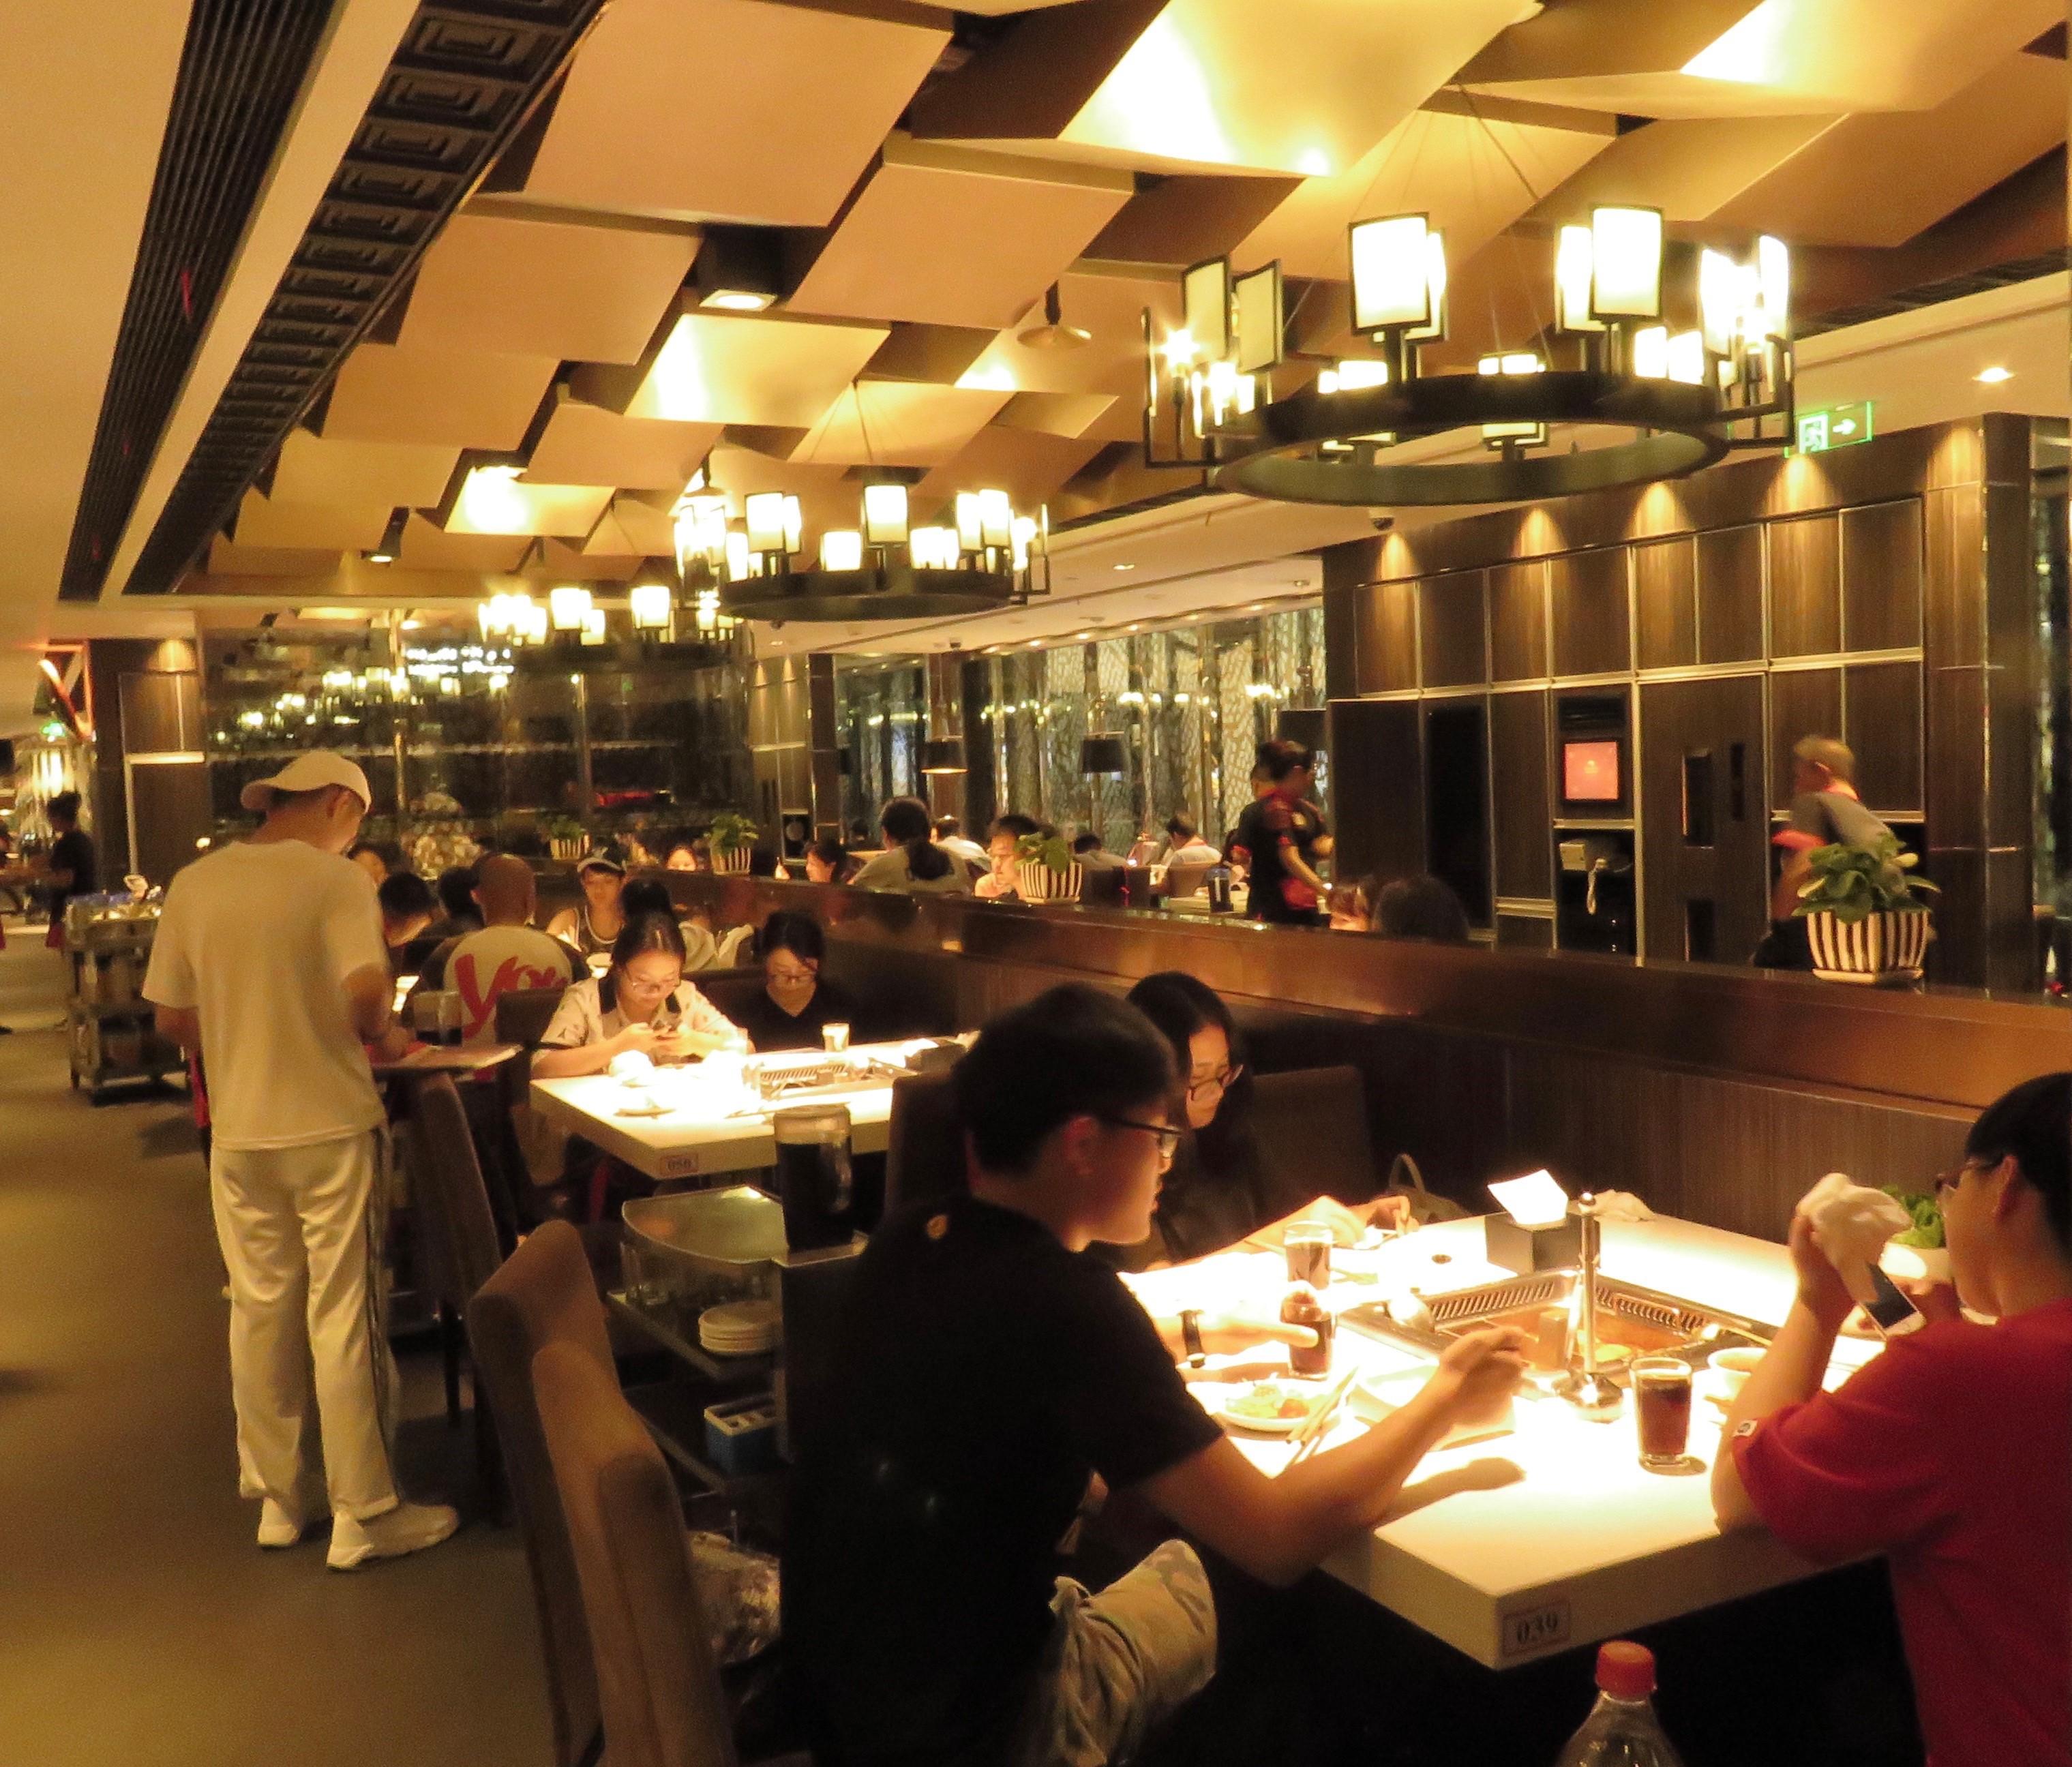 CAPAStudyAbroad_Shanghai_Fall2016_From_Caleb_Kostreva_-_My_Global_Education_-_HaiLiDao_Hot_Pot_restaurant.jpg